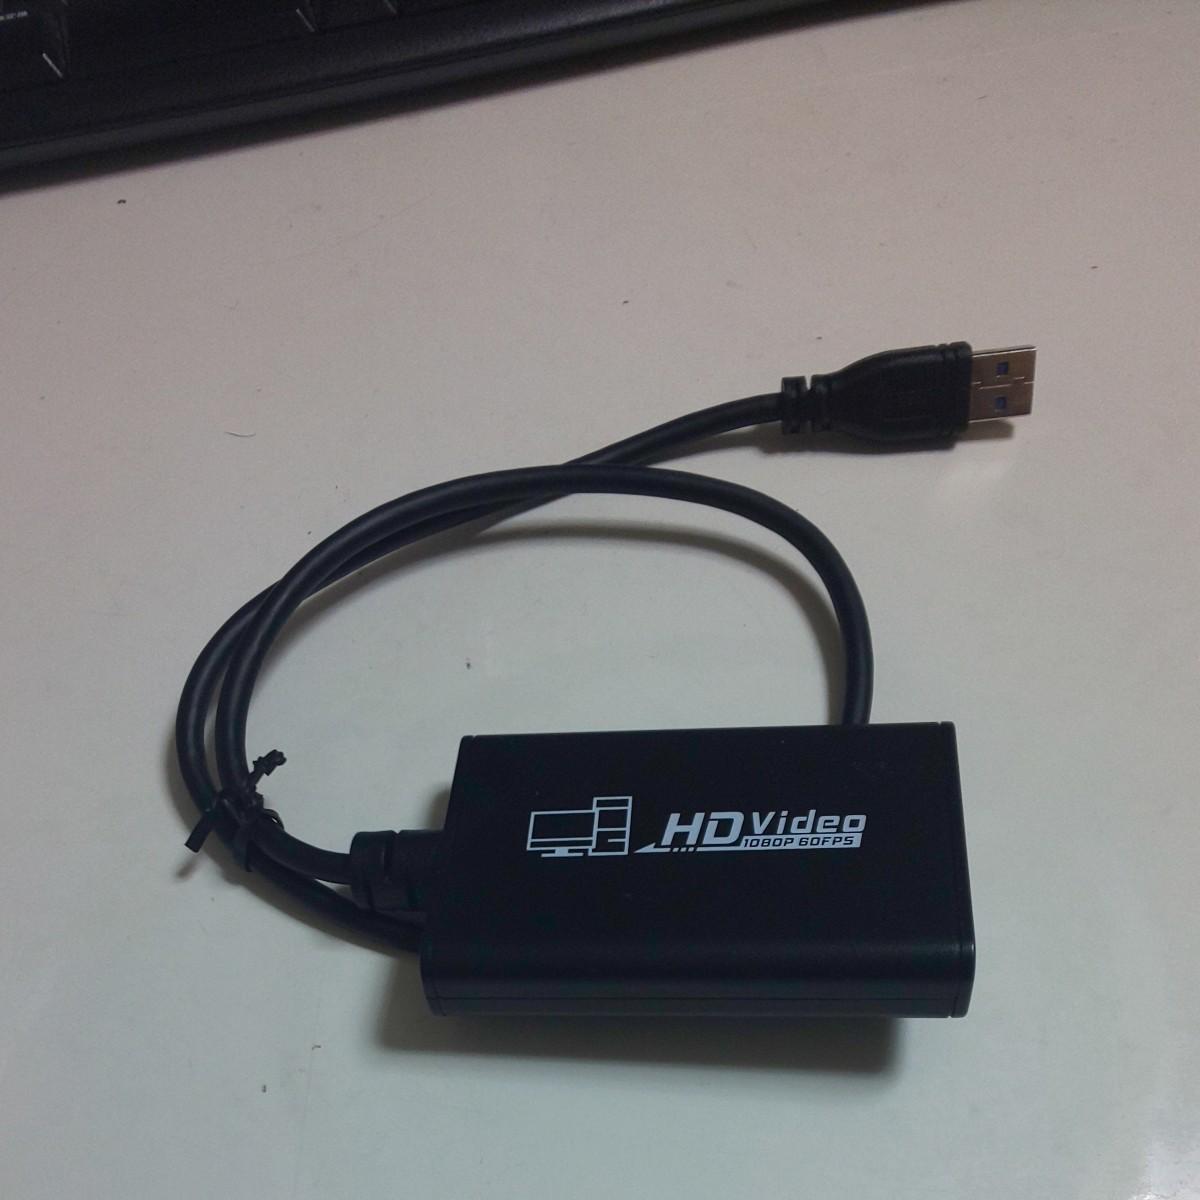 HDMI USB3.0 ビデオキャブチャー